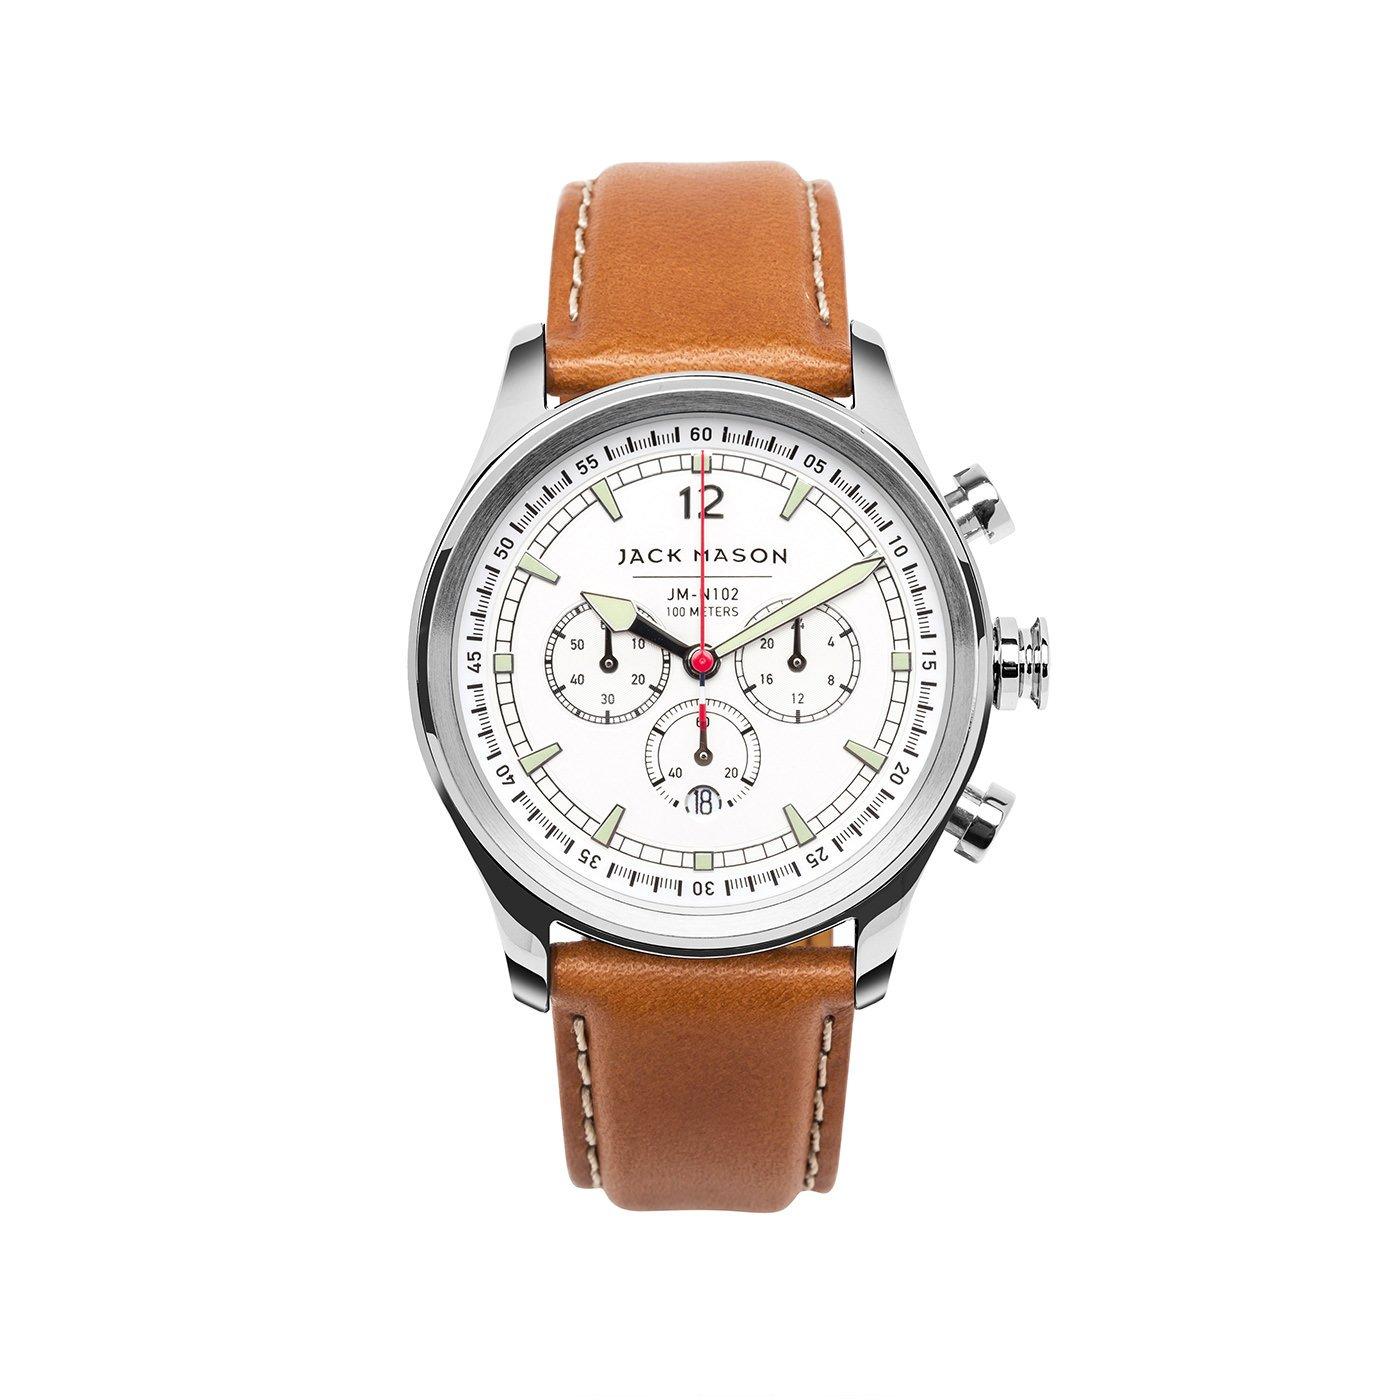 Jack Mason Men's Chronograph Watch Nautical Tan Italian Leather Strap JM-N102-018